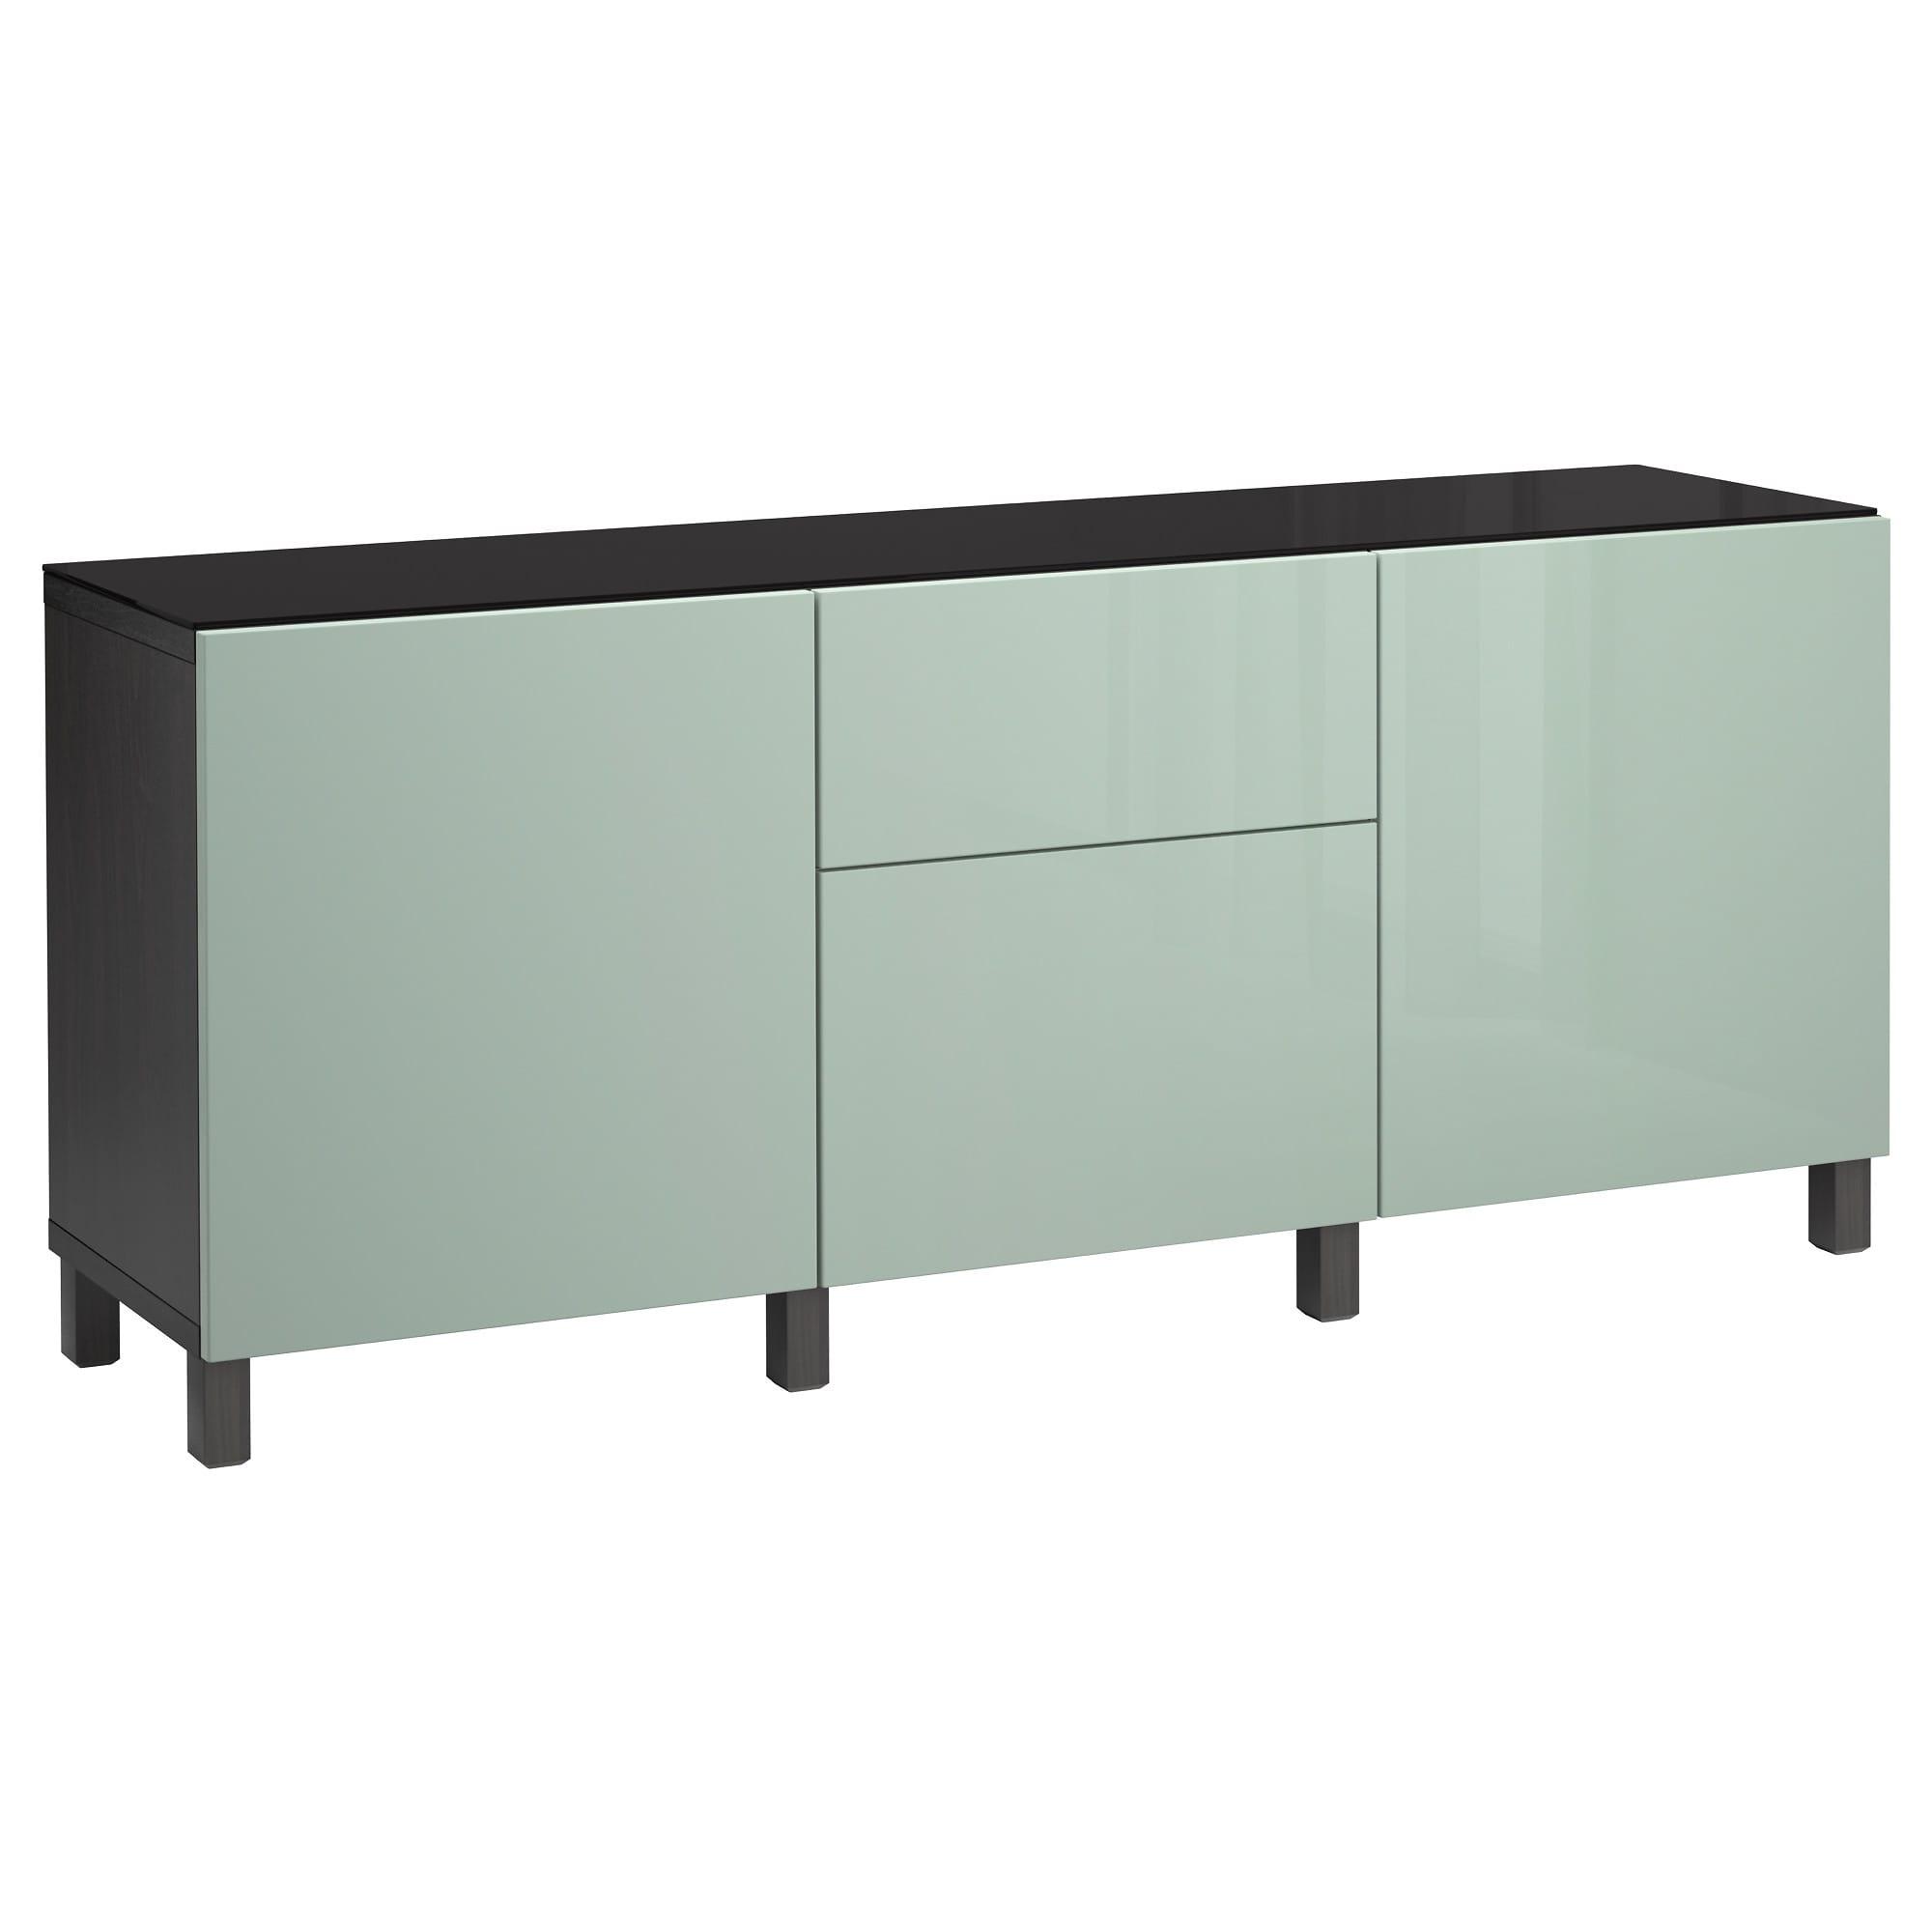 Mueble Consola Ikea Drdp Armarios Aparadores Para Salà N O Edor Pra Online Ikea